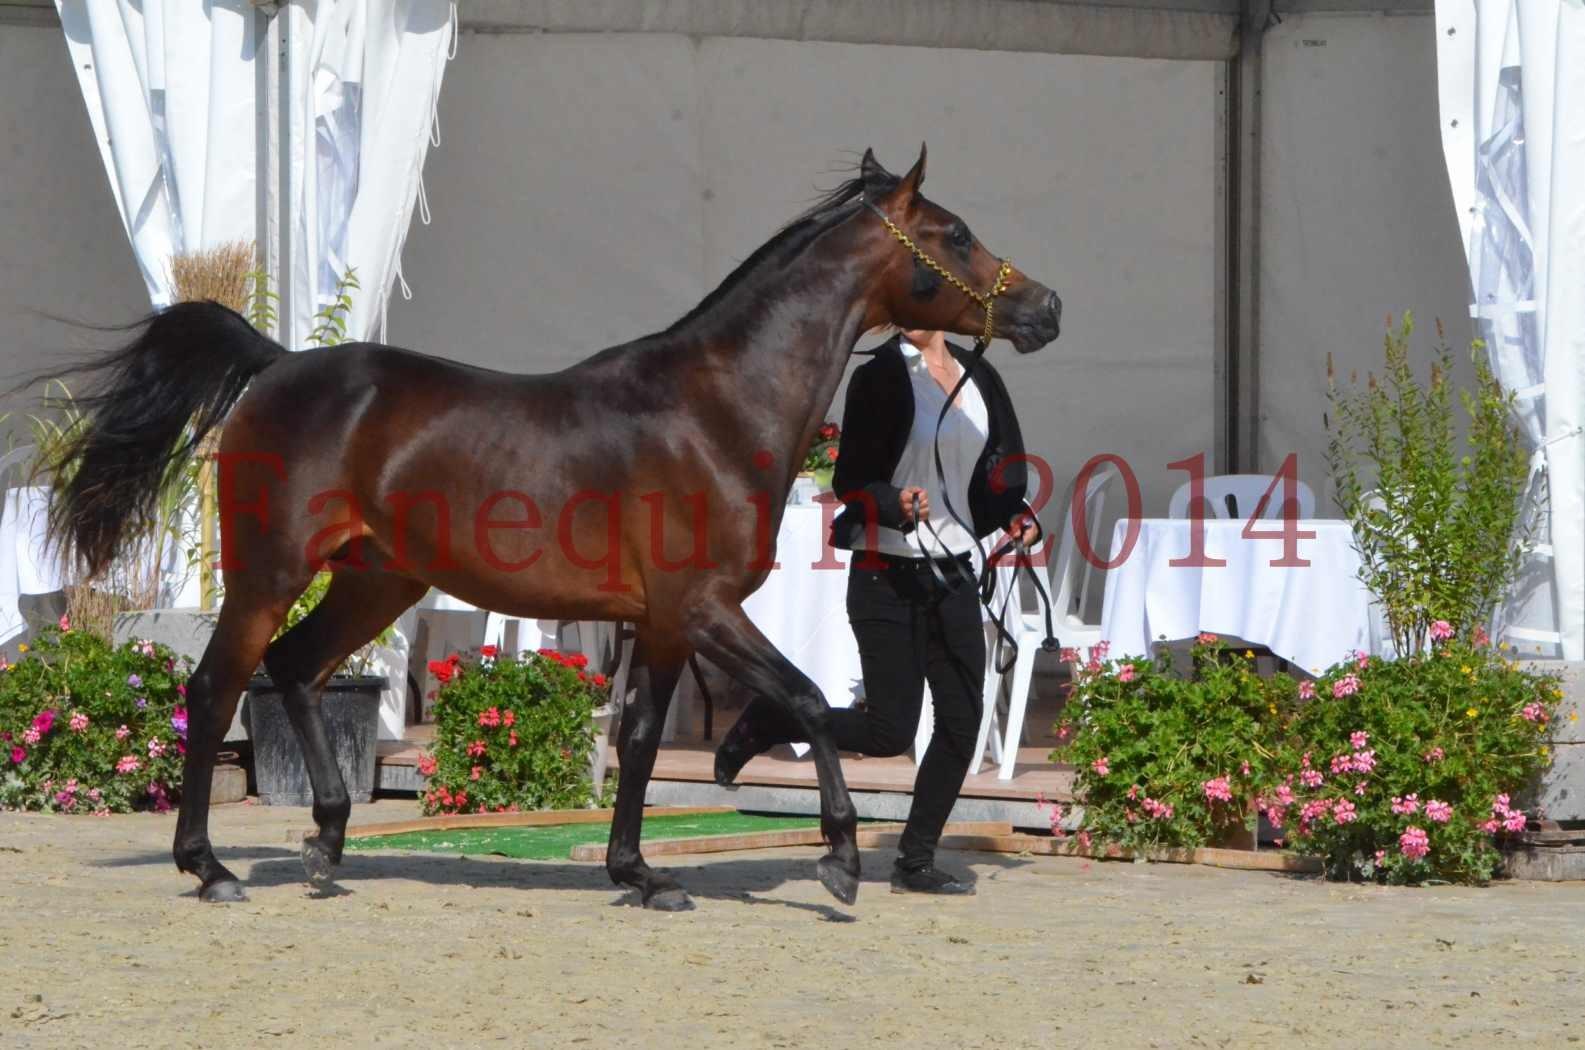 Championnat de FRANCE 2014 - Amateurs - JA KHALEB - 26